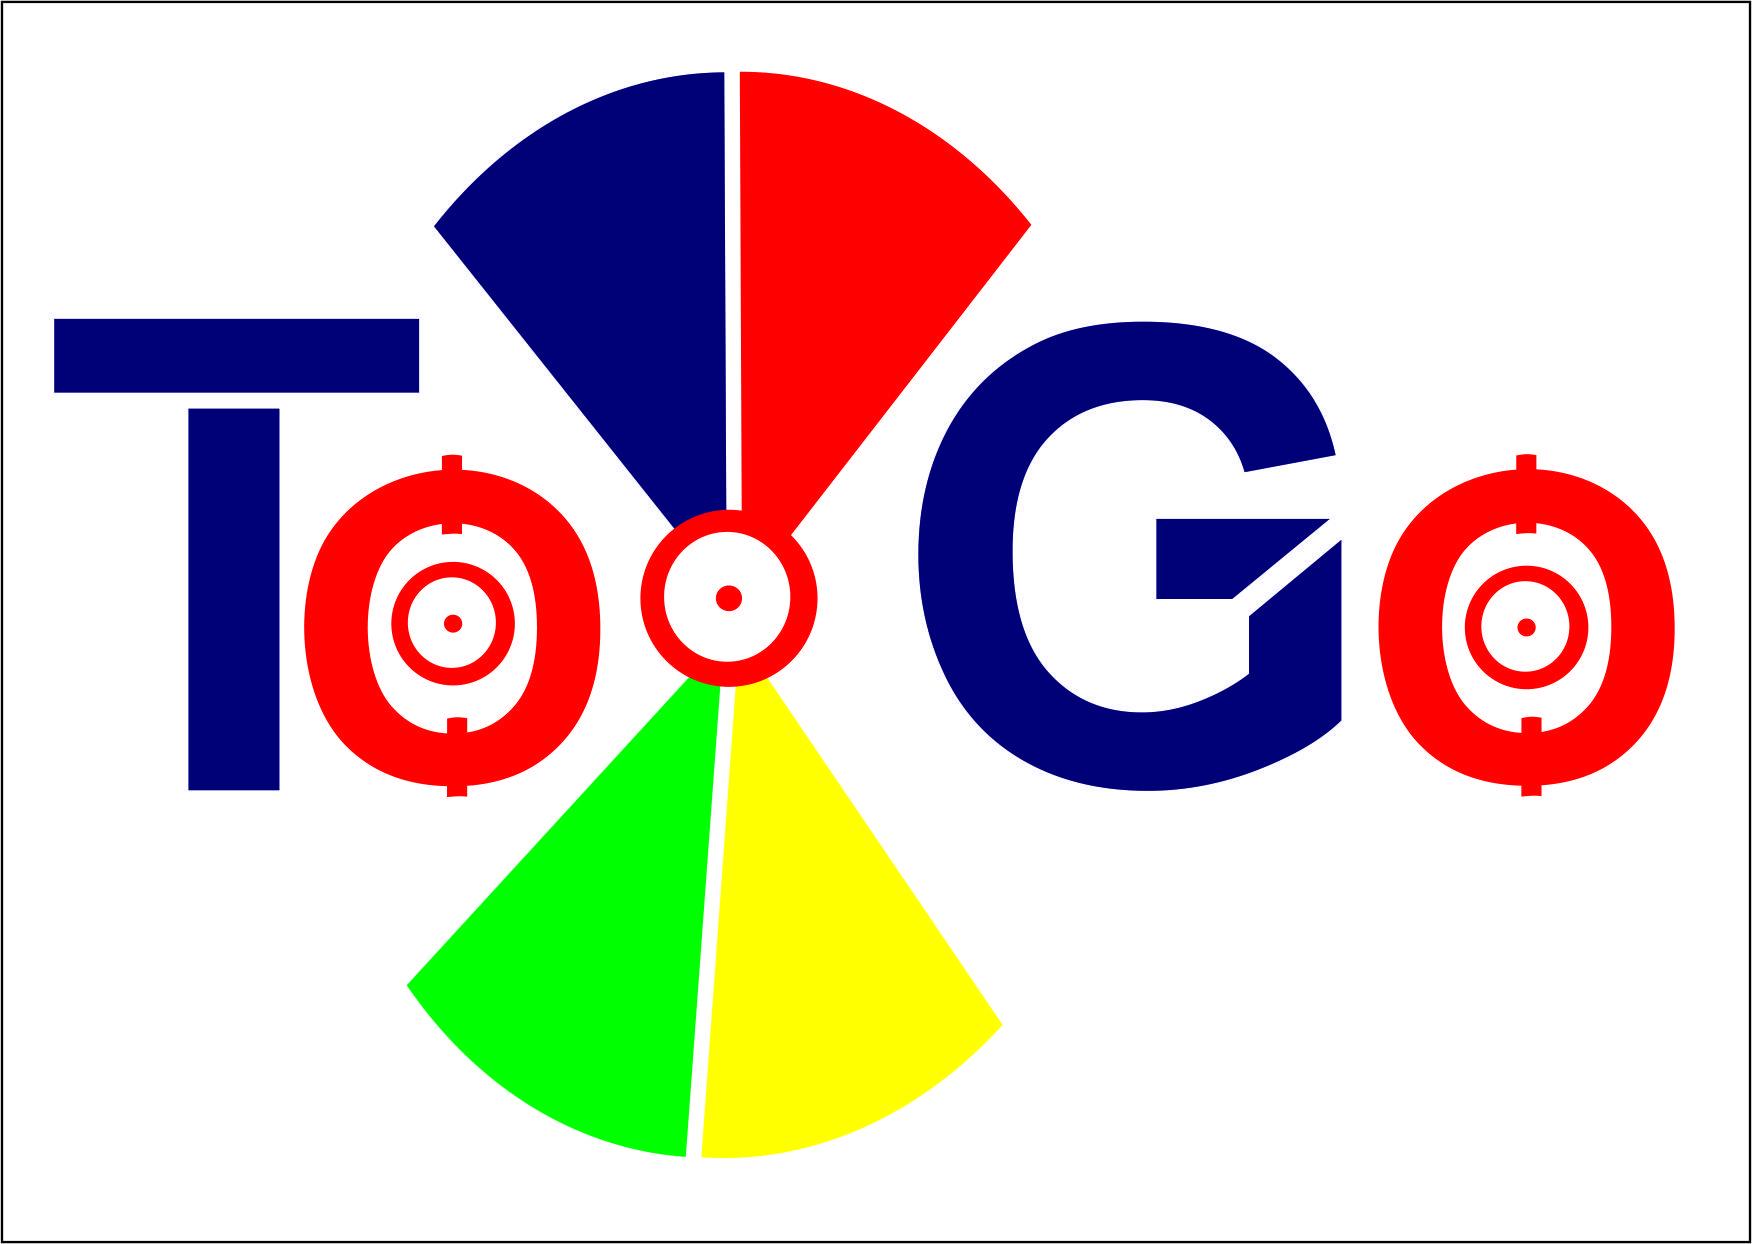 Разработать логотип и экран загрузки приложения фото f_7345a8bbeba1e6d1.jpg